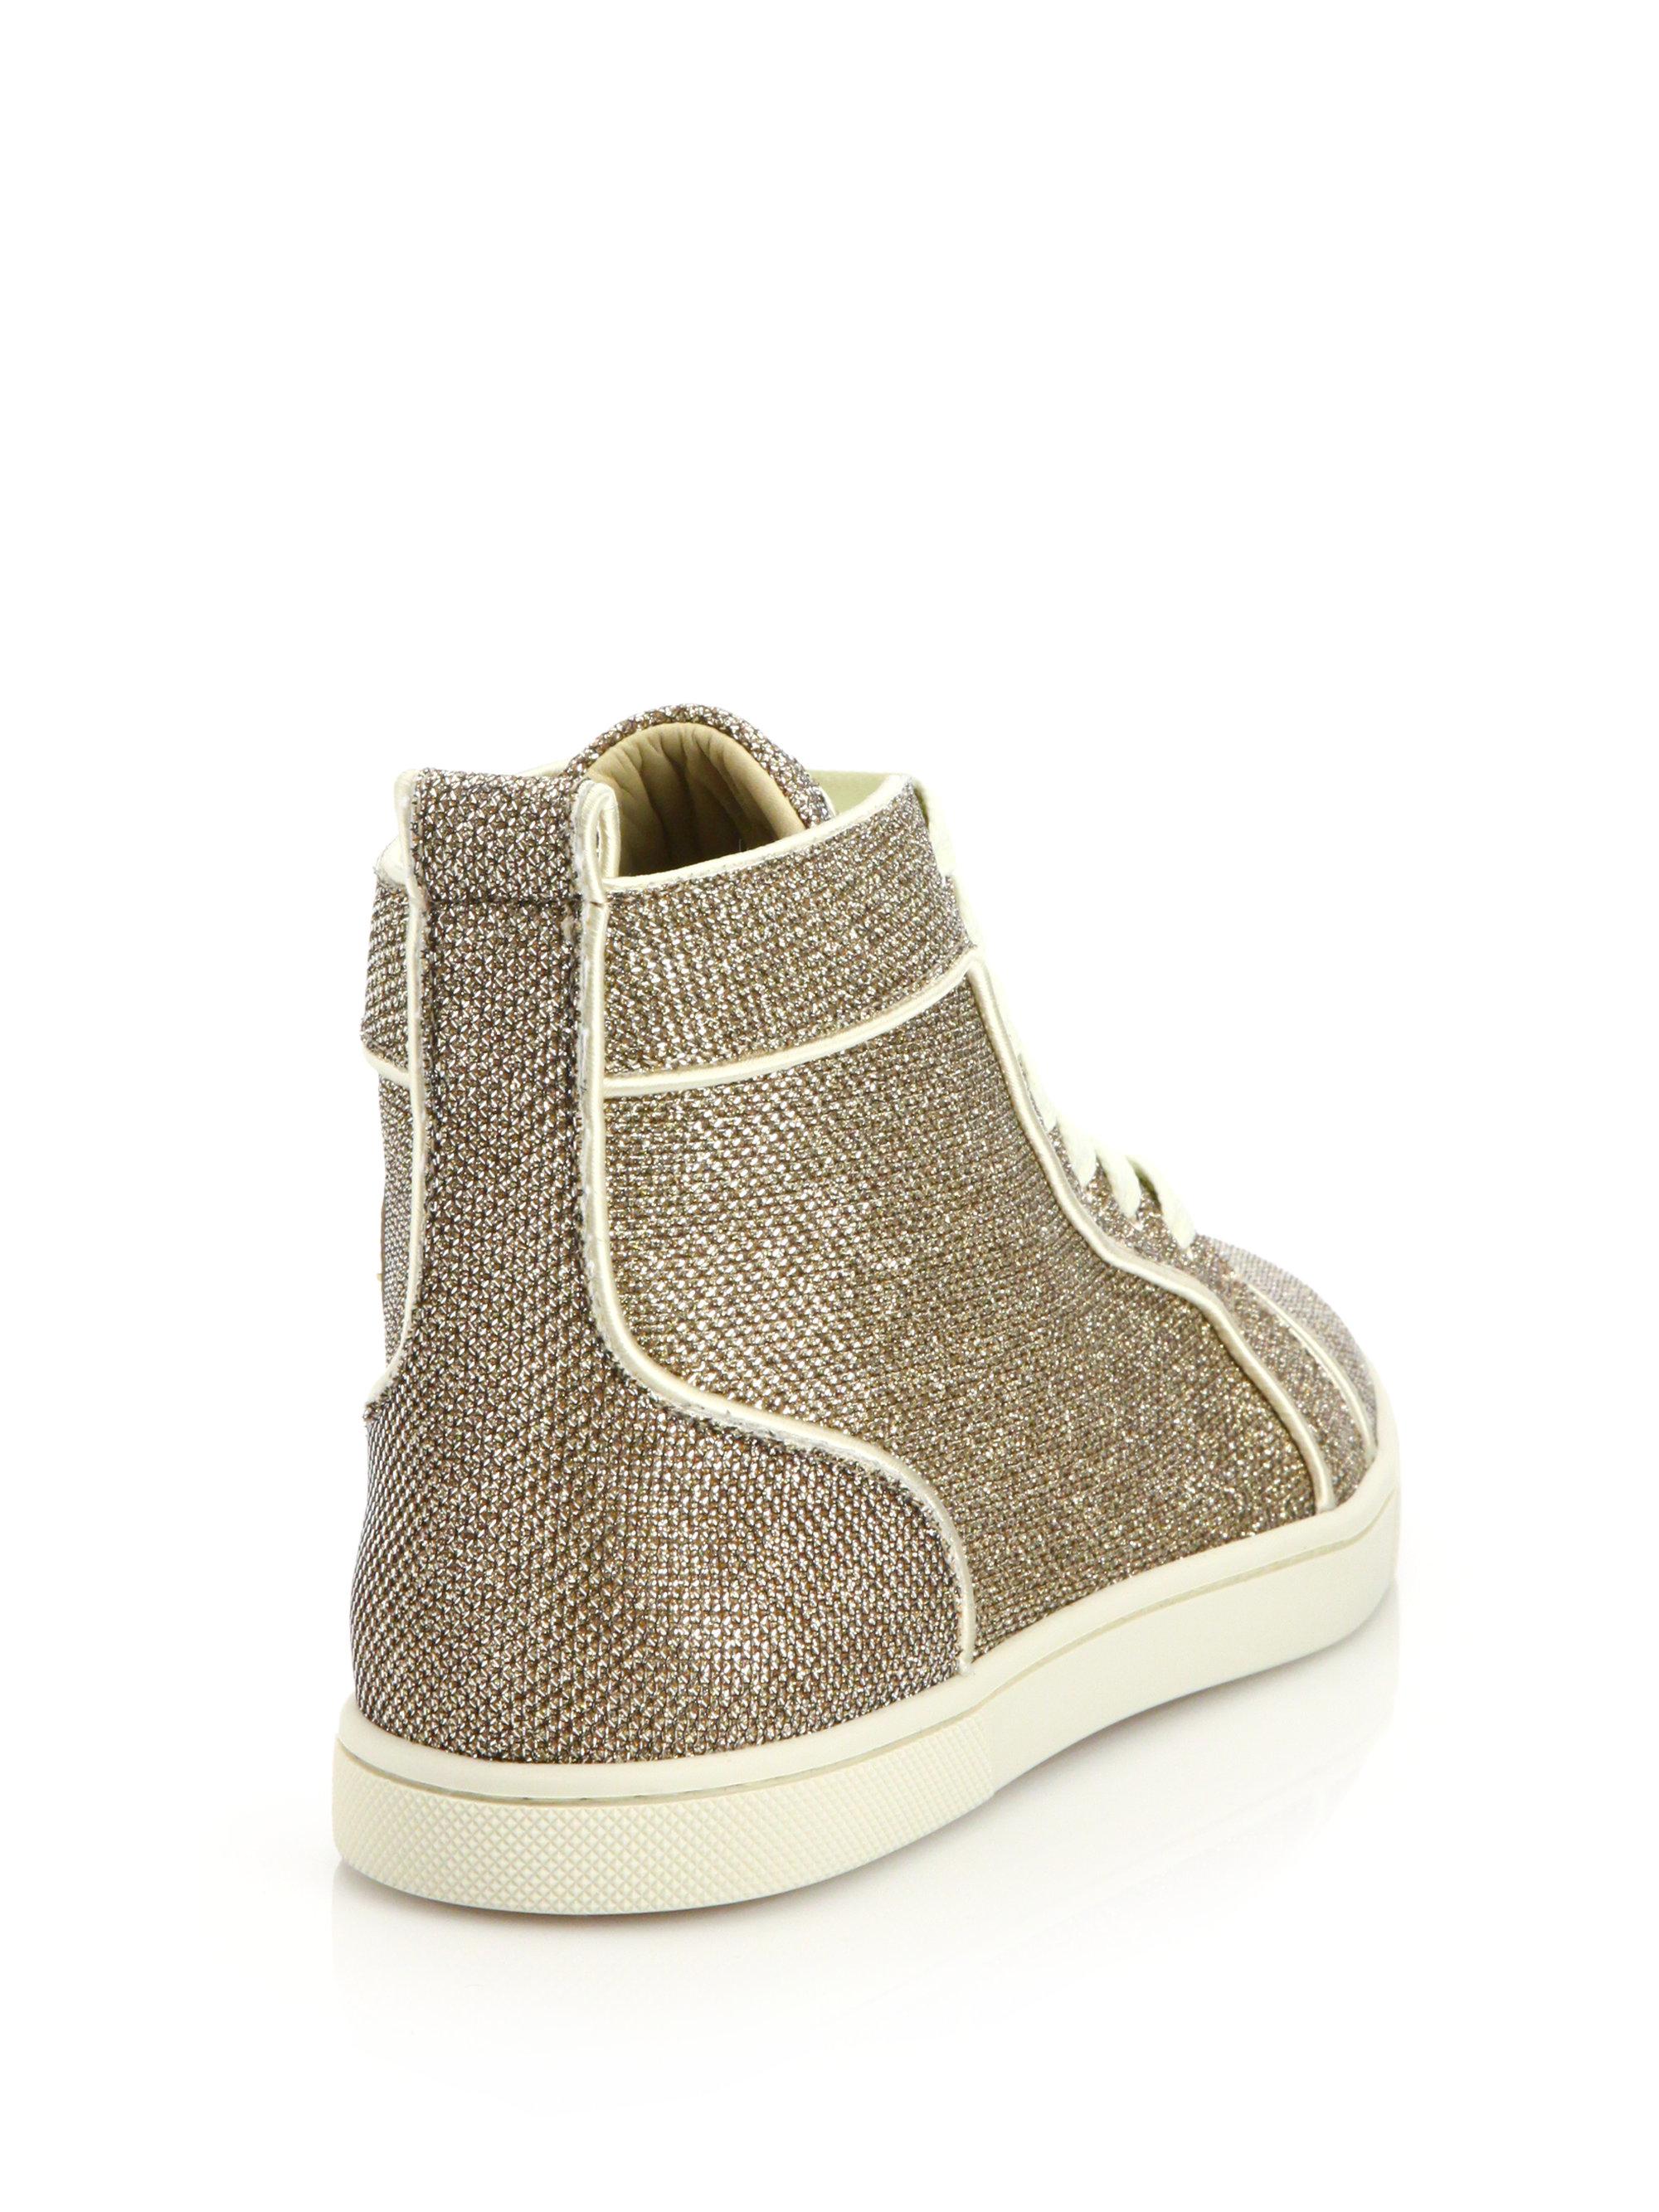 Christian louboutin Glitter Hi-top Sneakers in Gold | Lyst